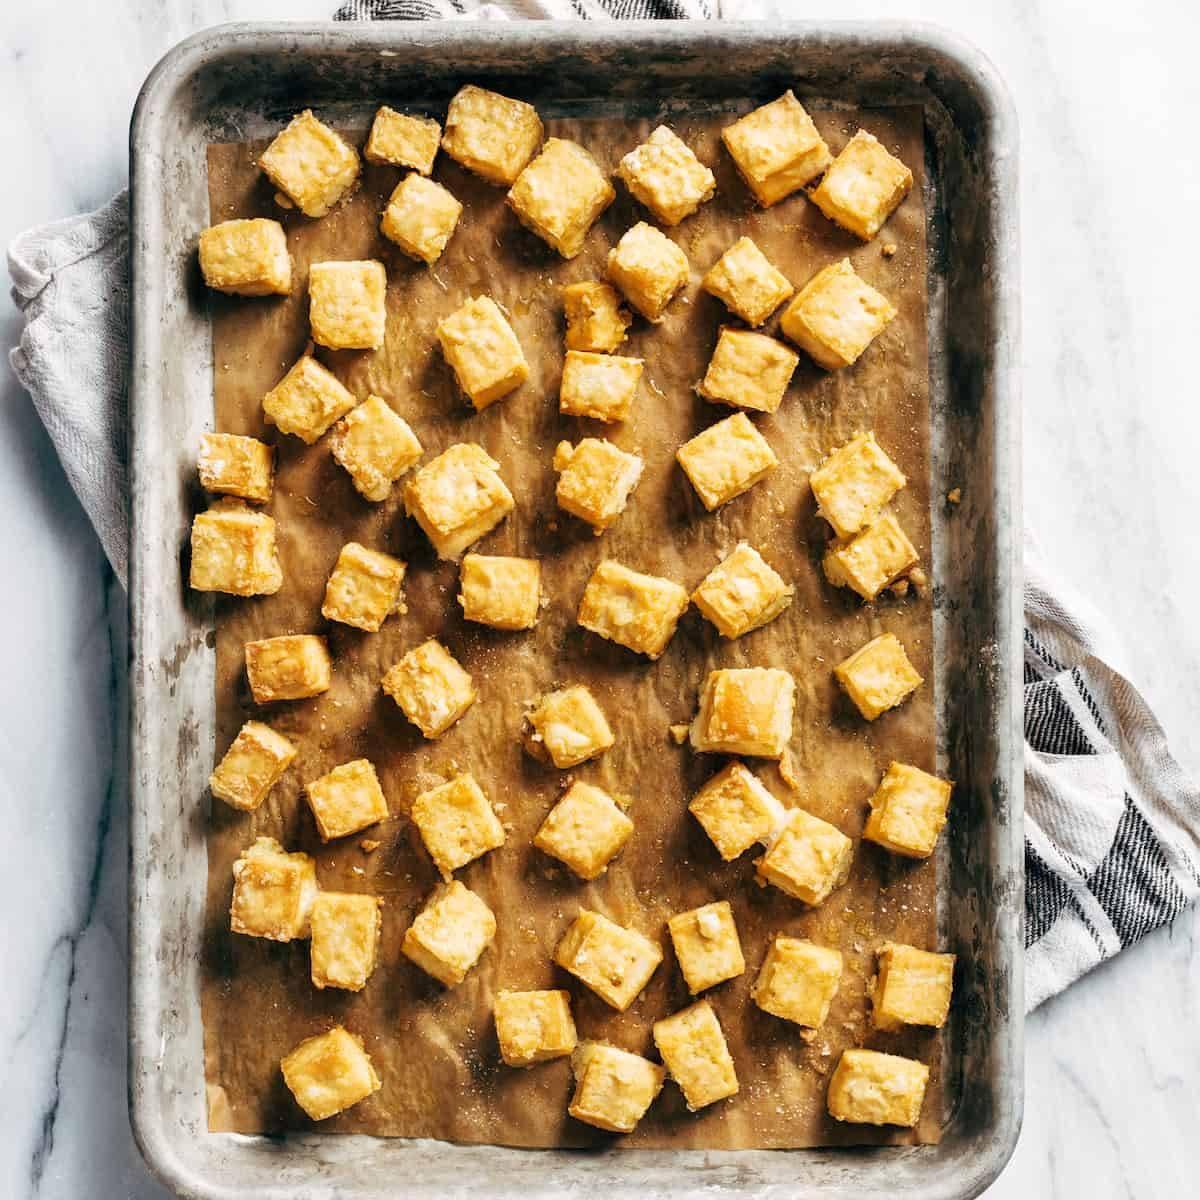 Crispy tofu on a baking sheet after baking.